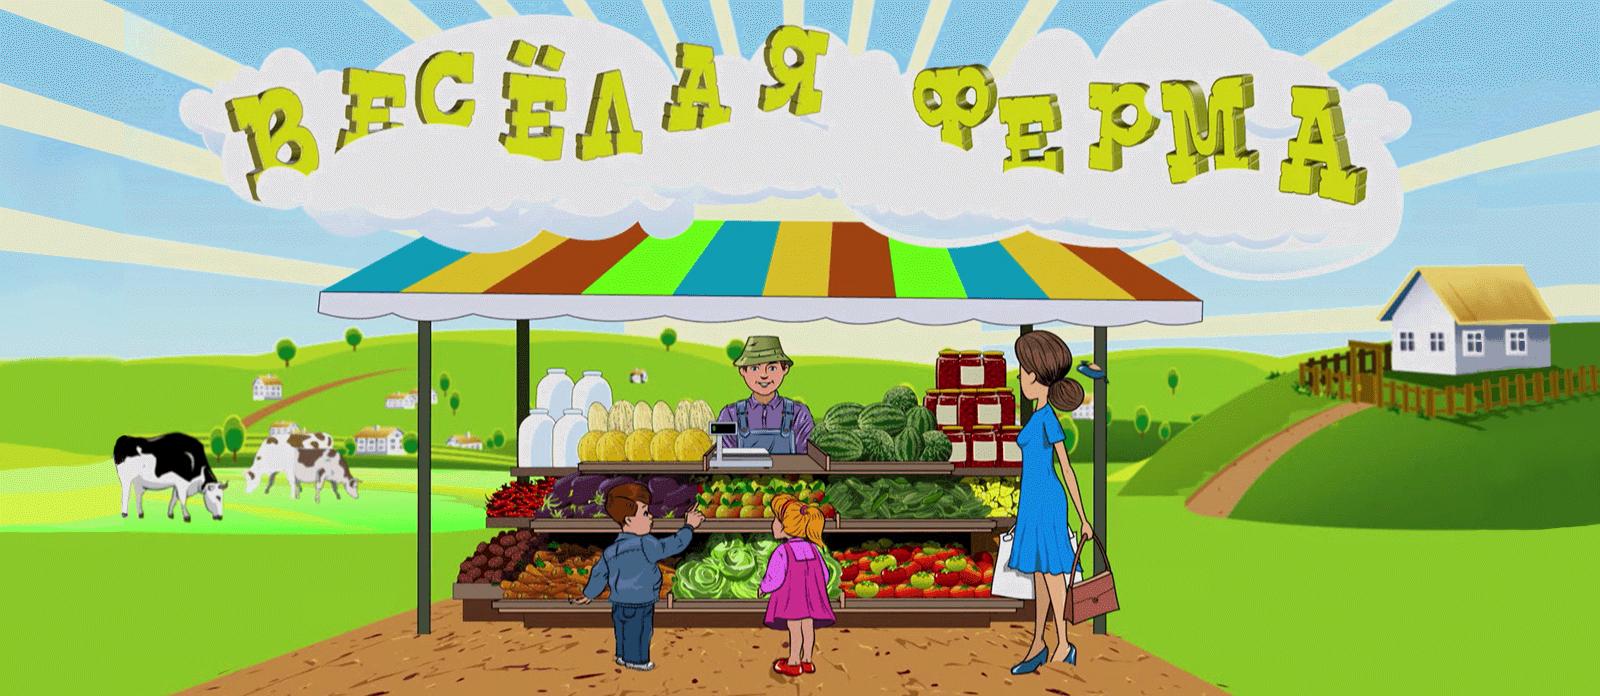 Весёлая ферма